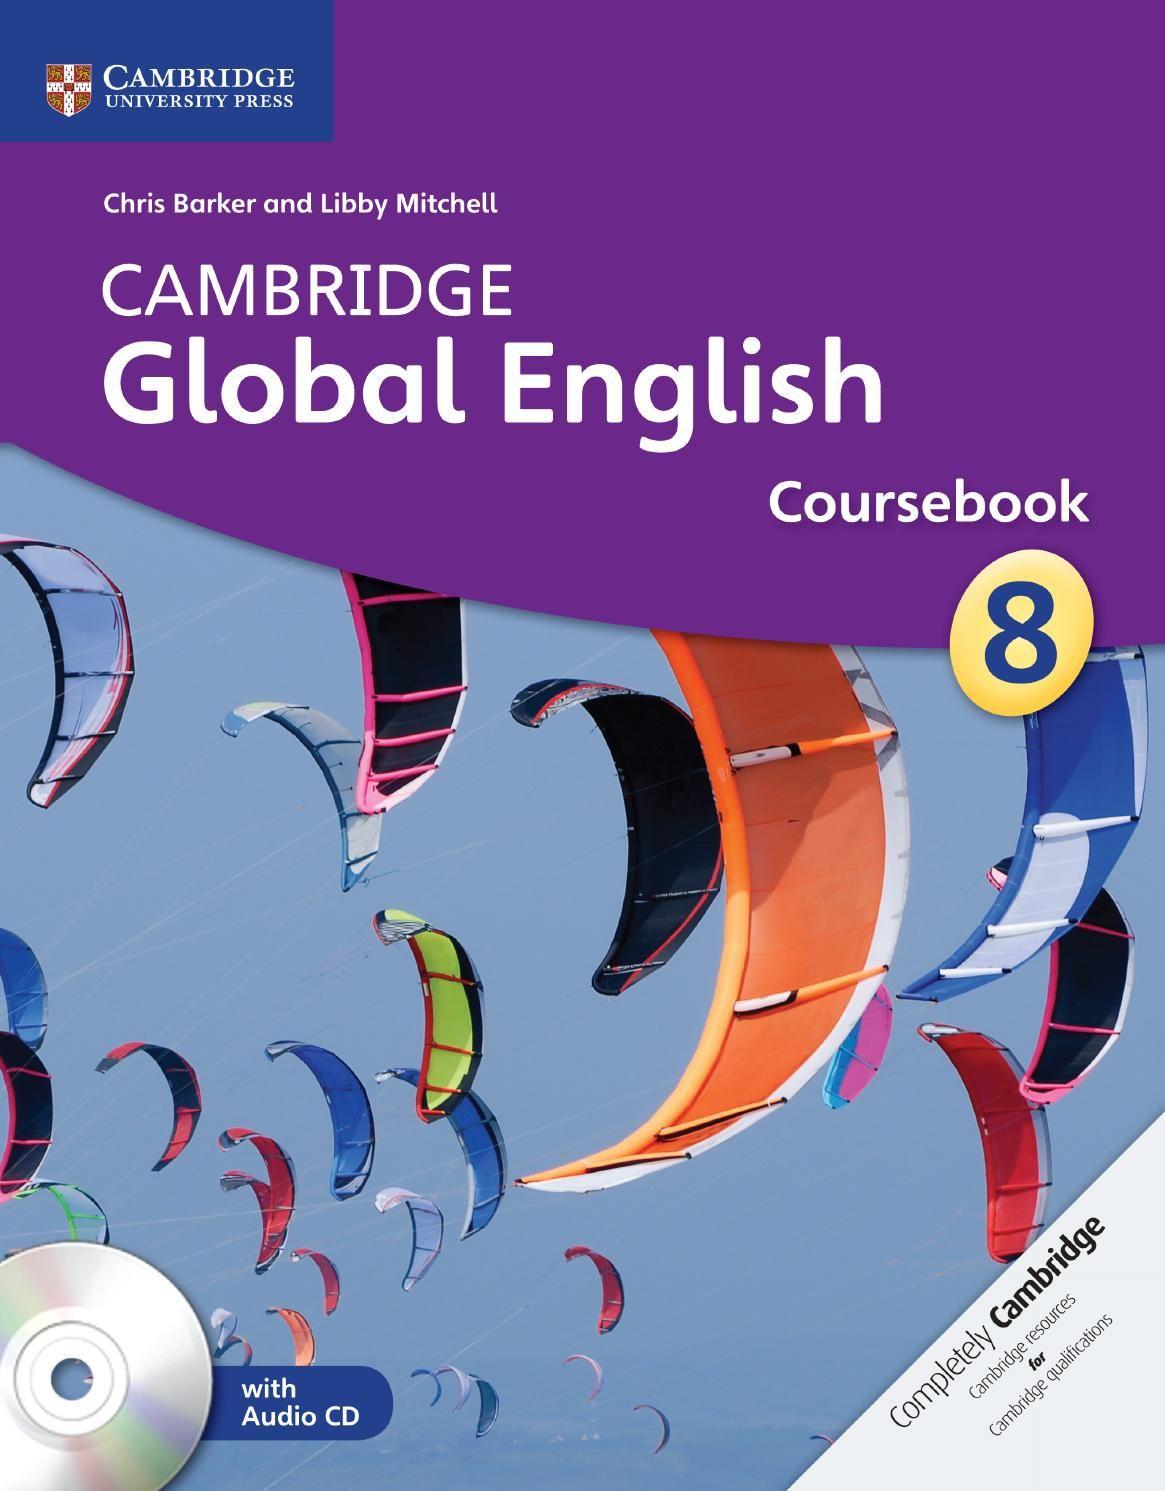 Cambridge Global English Coursebook With Audio CD Stage 8